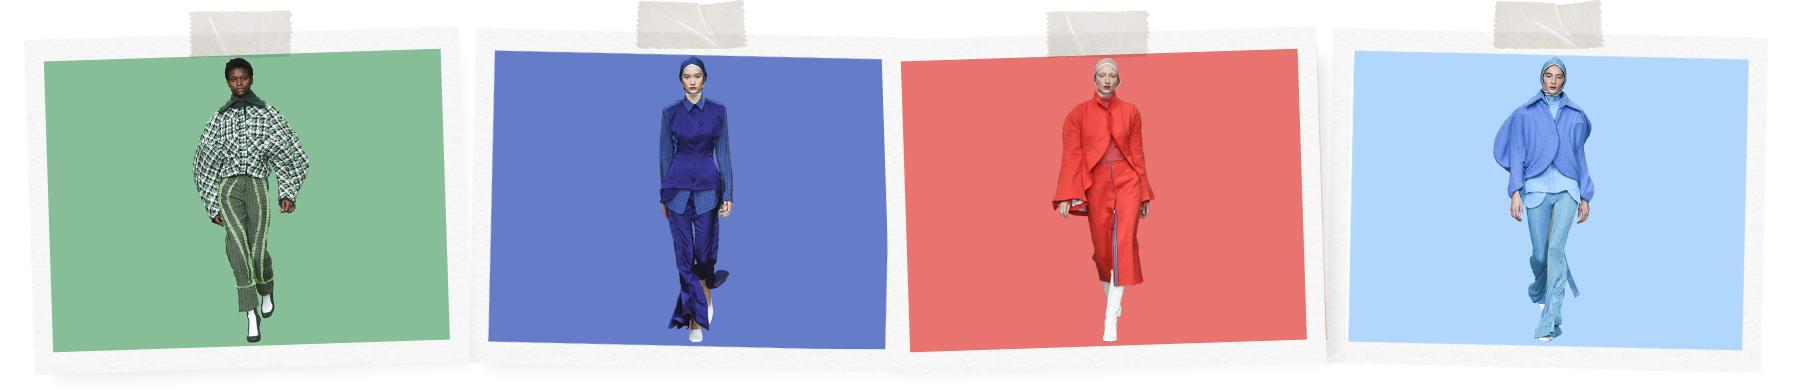 Catwalk cutouts of Richard Malone's AW18 collection.